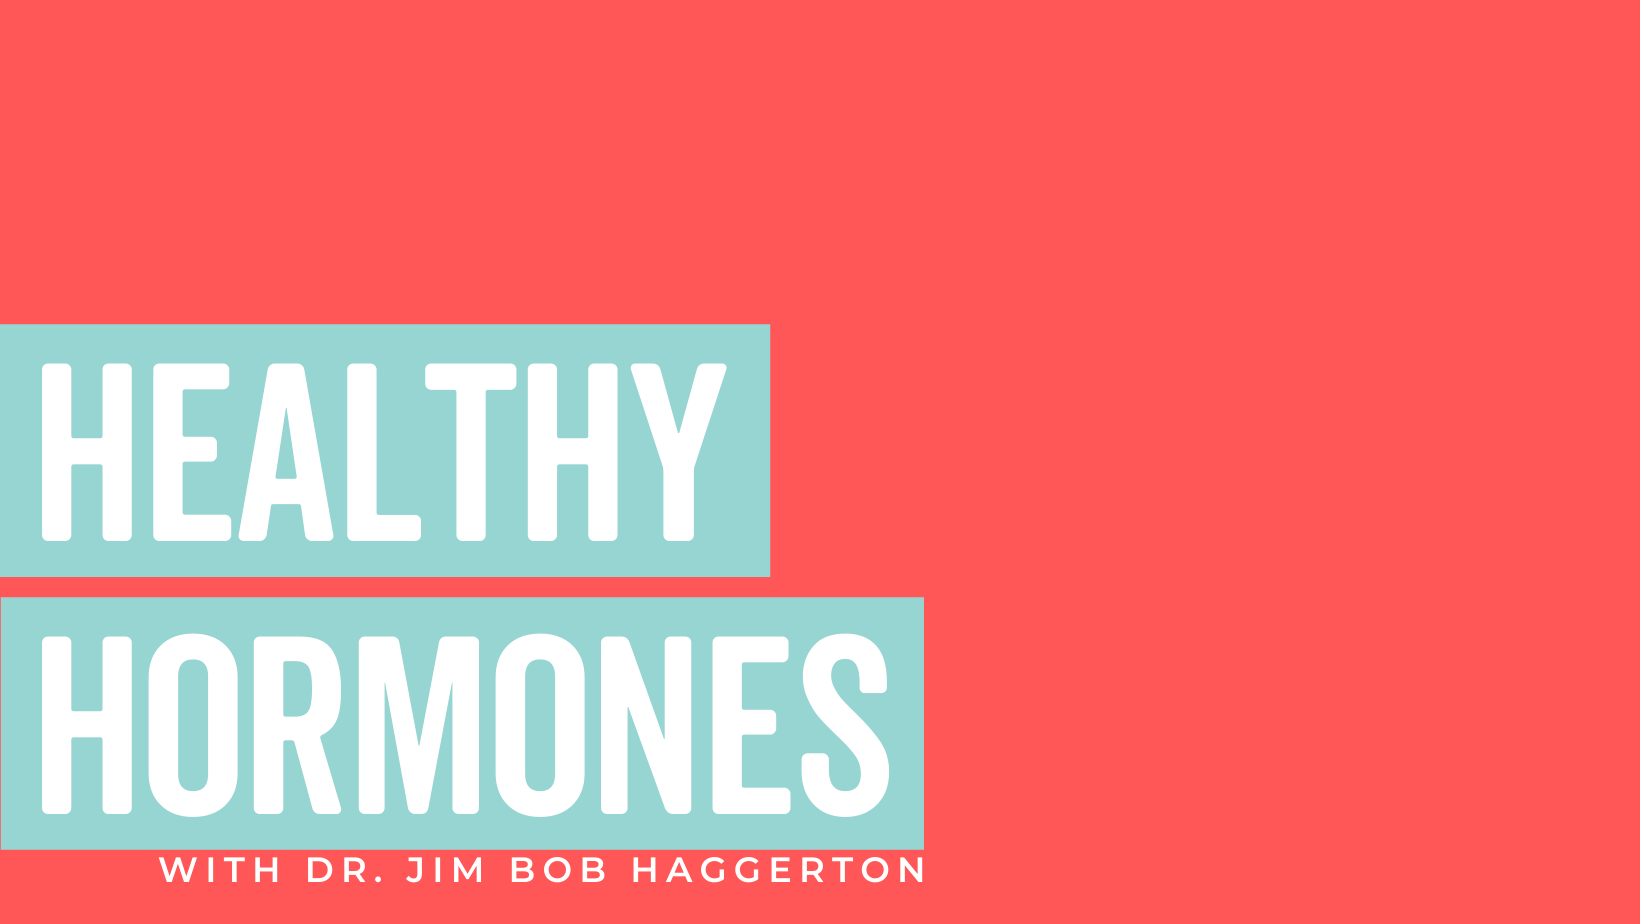 Healthy Hormones Program